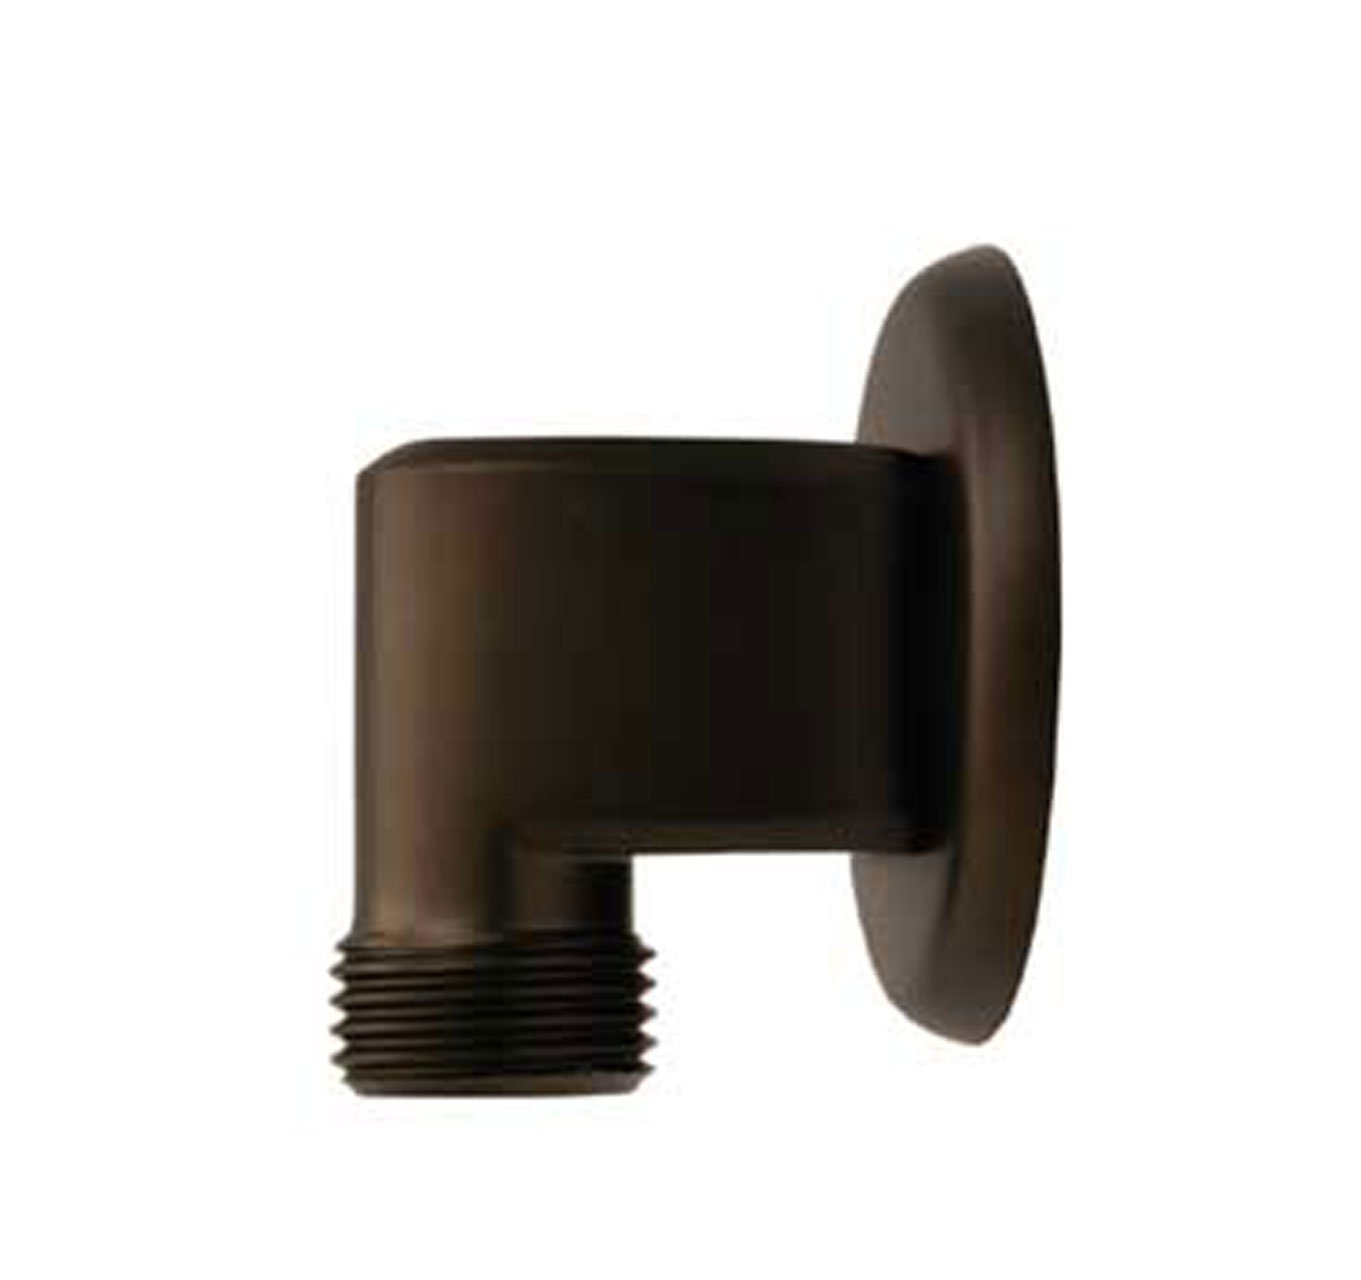 Polished Brass Whitehaus WH173A2-PBRAS Showerhaus Bathroom Supply Elbow